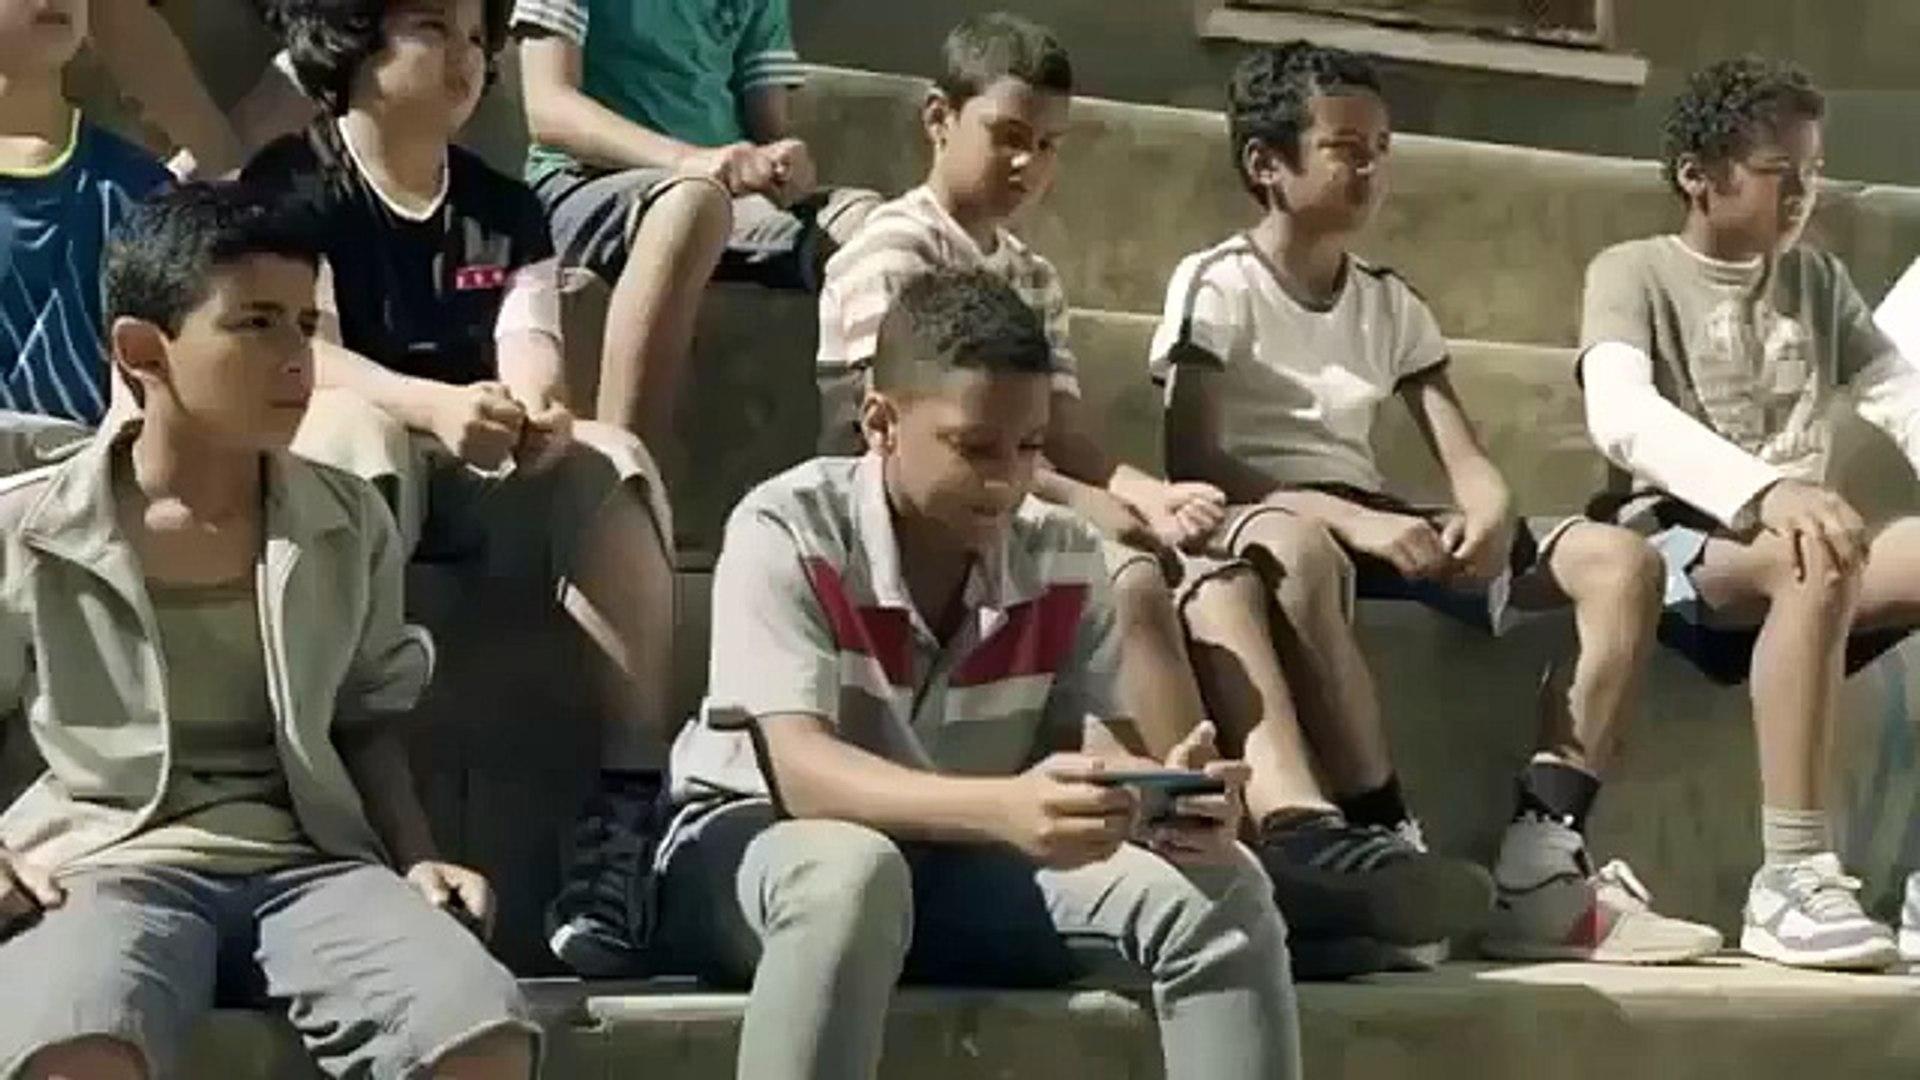 Messi vs Kids playing football